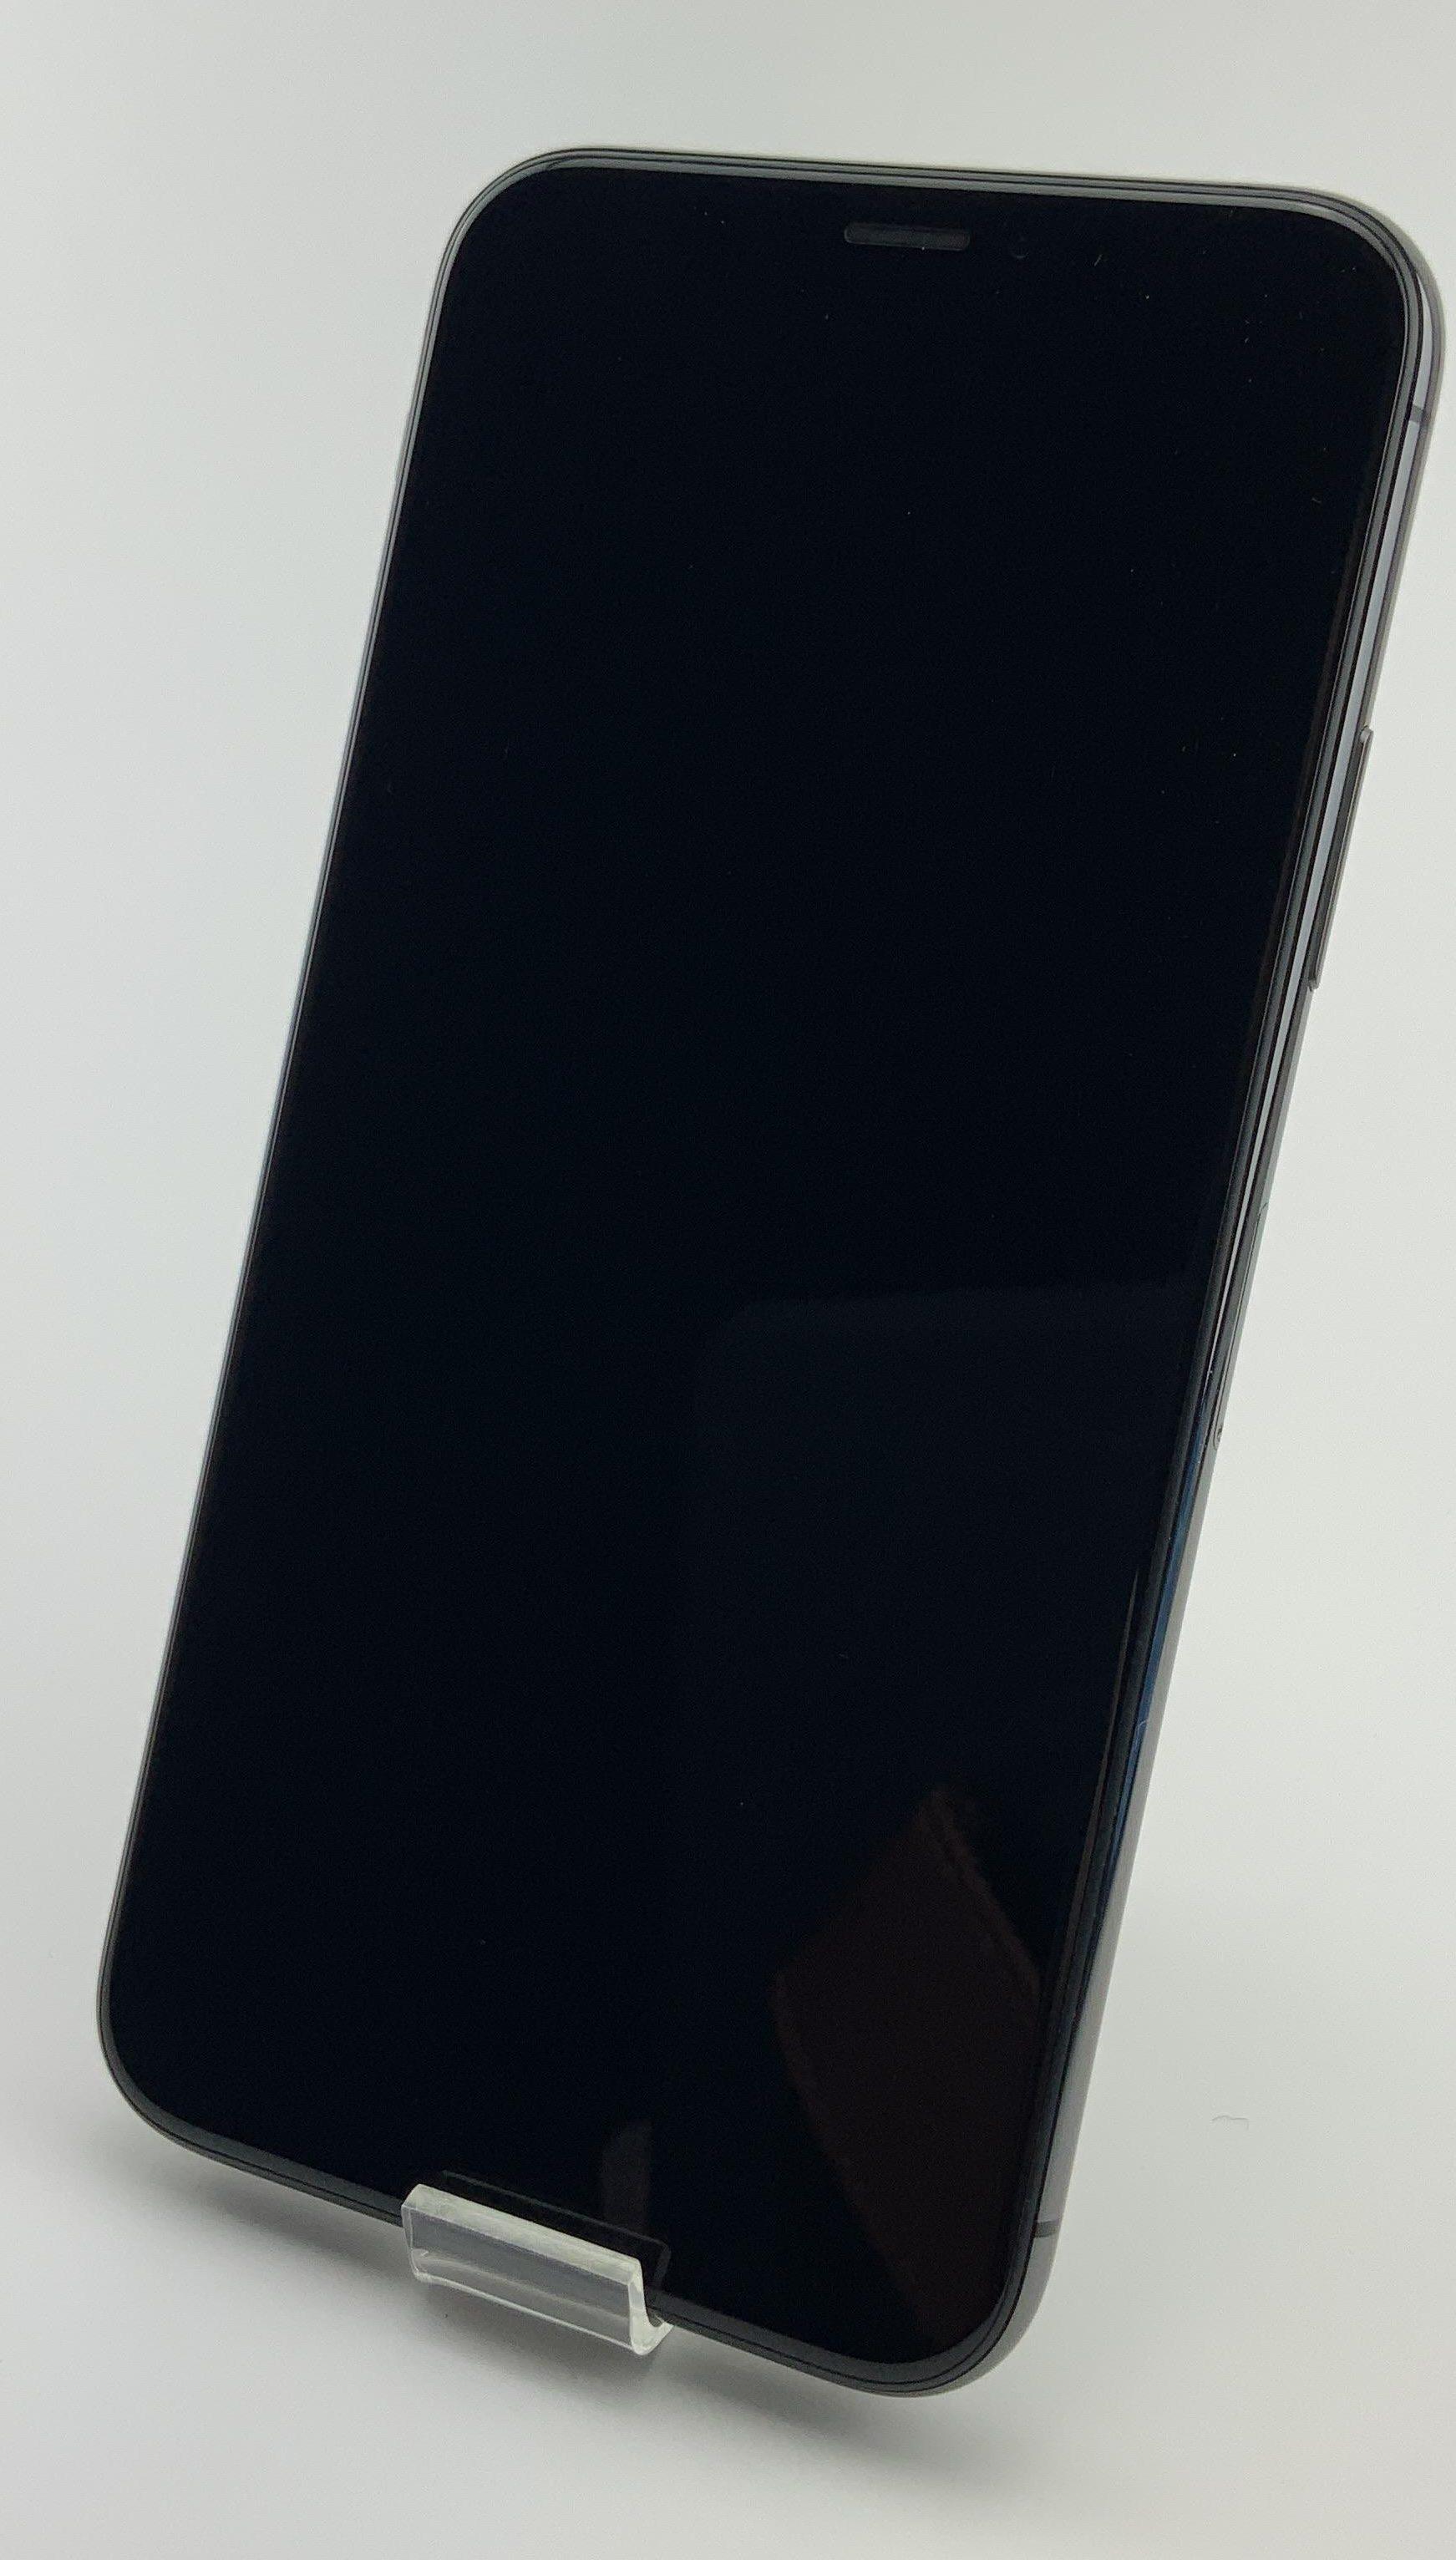 iPhone XS 64GB, 64GB, Space Gray, Bild 1